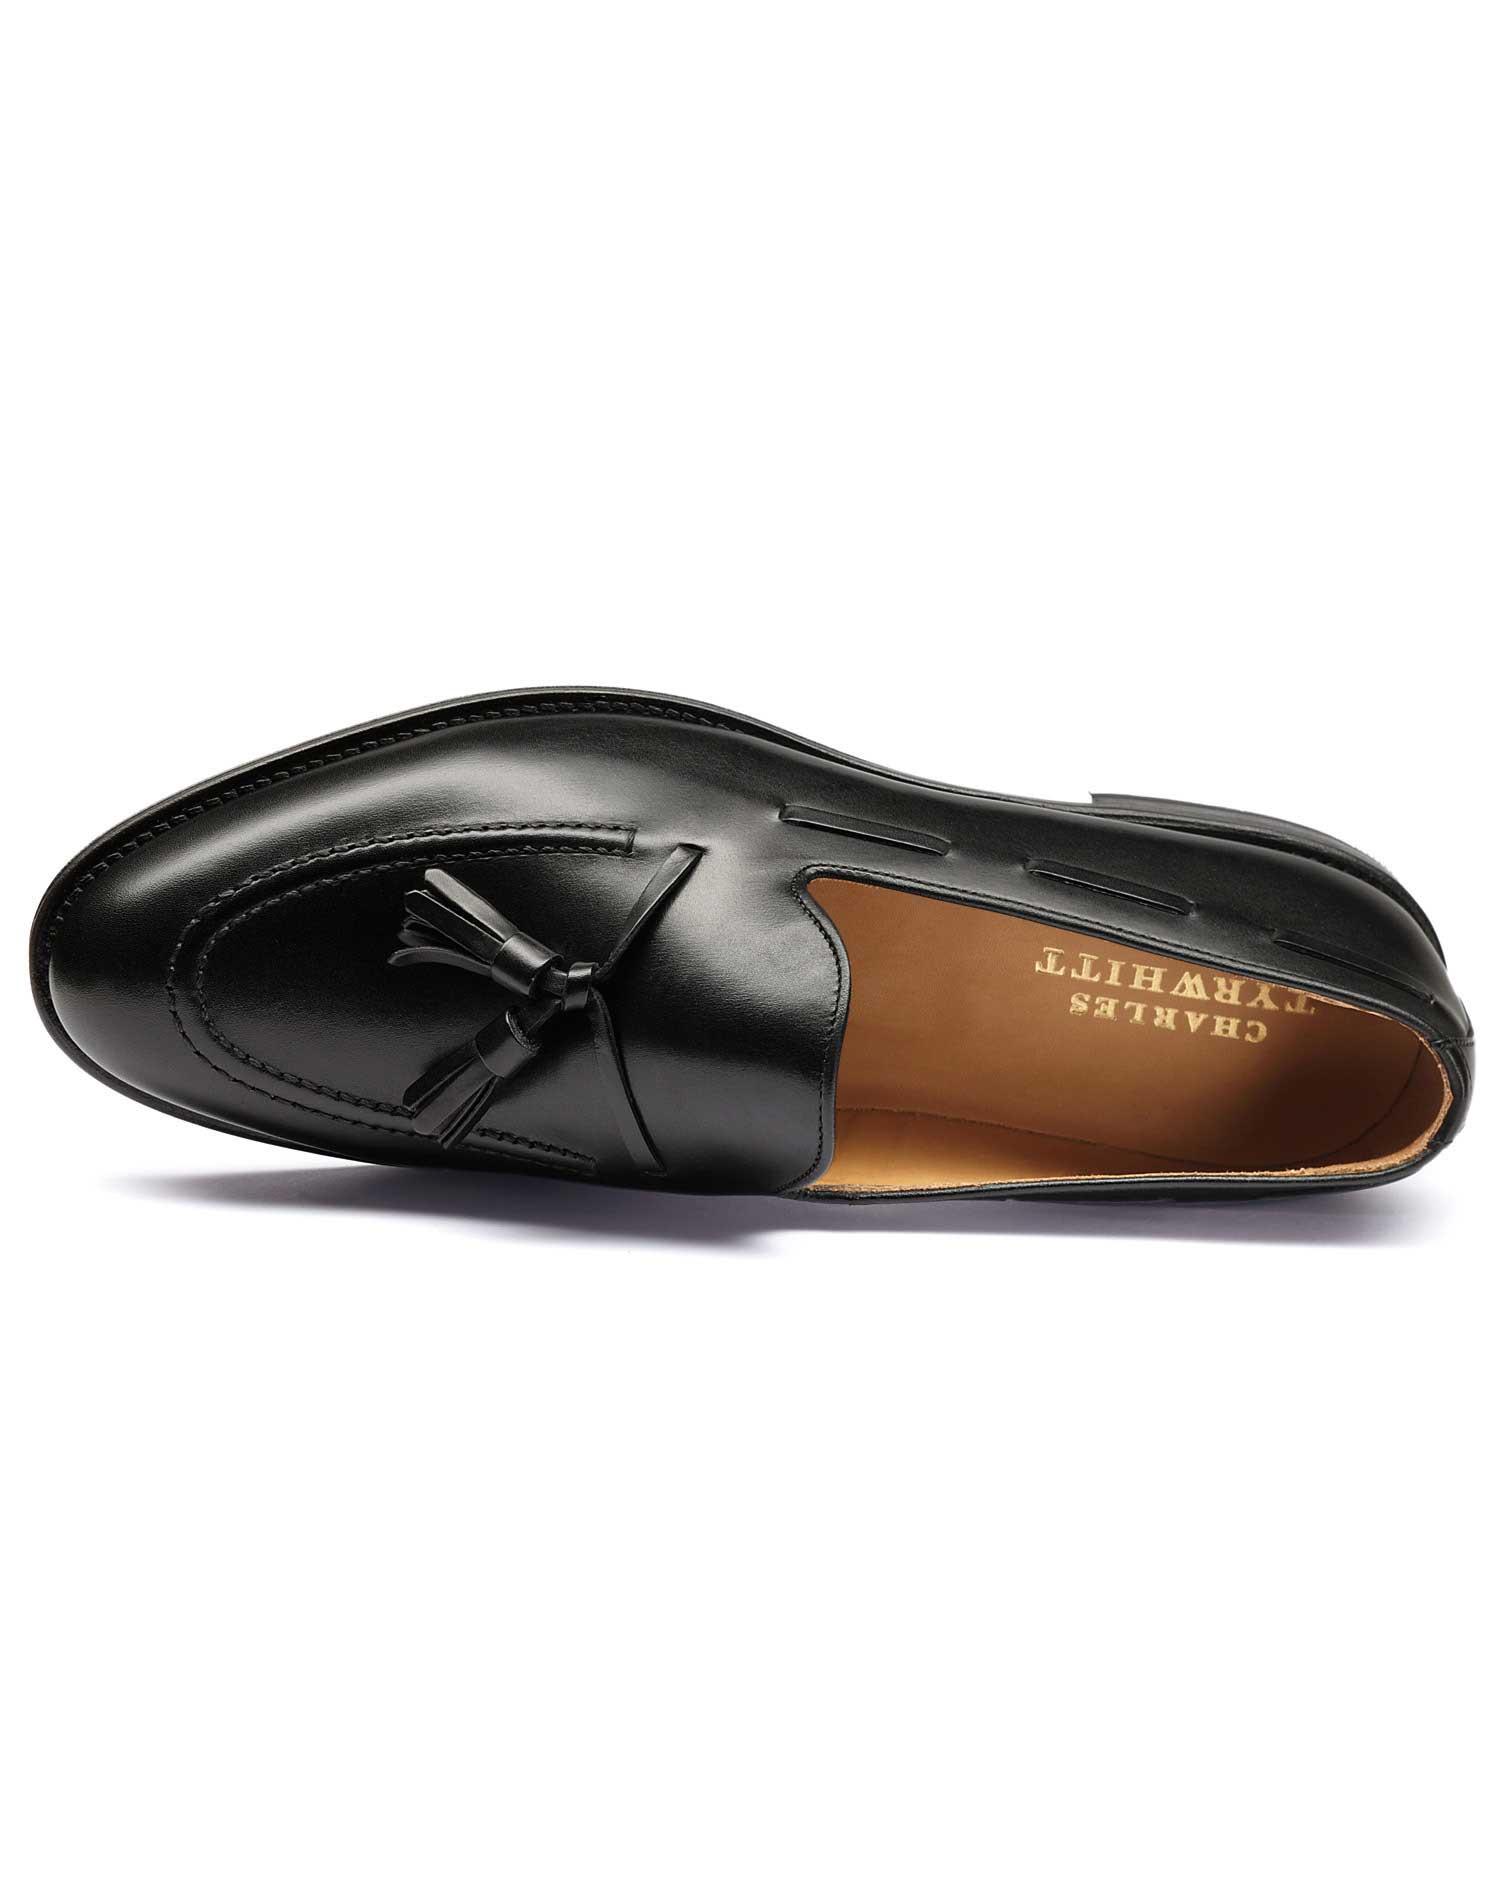 Black Keybridge Tassel Loafers Size 13 R by Charles Tyrwhitt